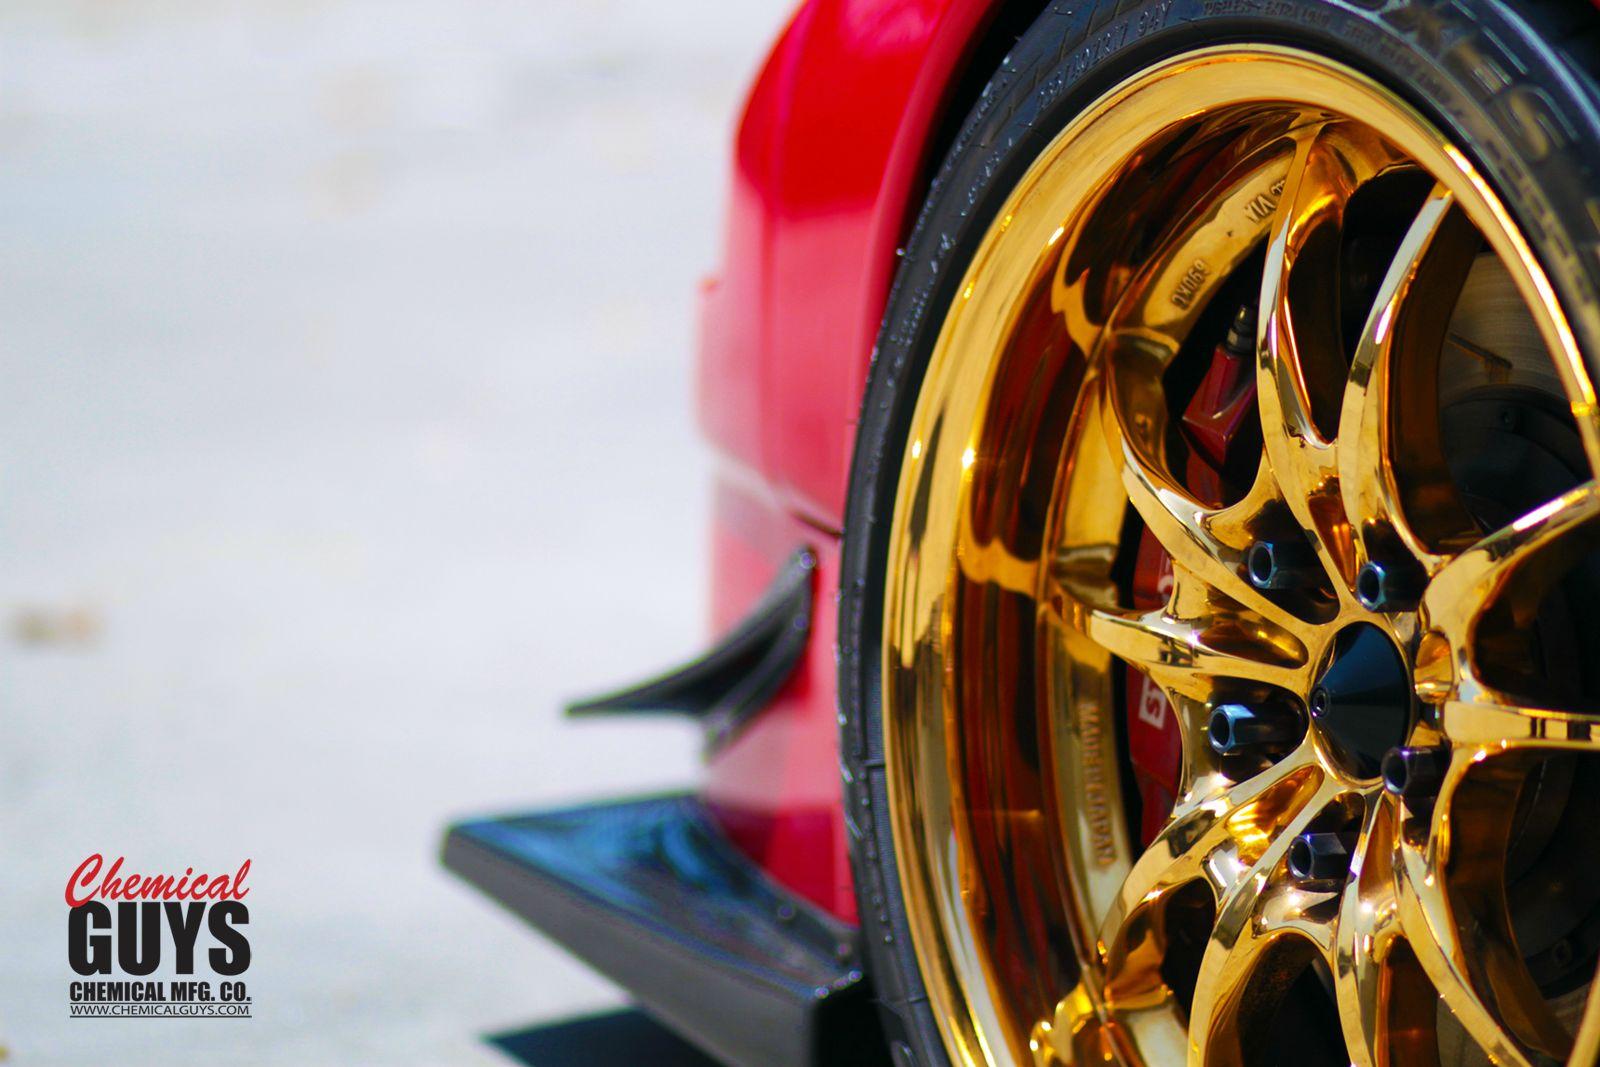 Wallpaper Thursdays Wheel Guard And Goooold Chemical Guys Mfg Co Auto Detailing Supplies